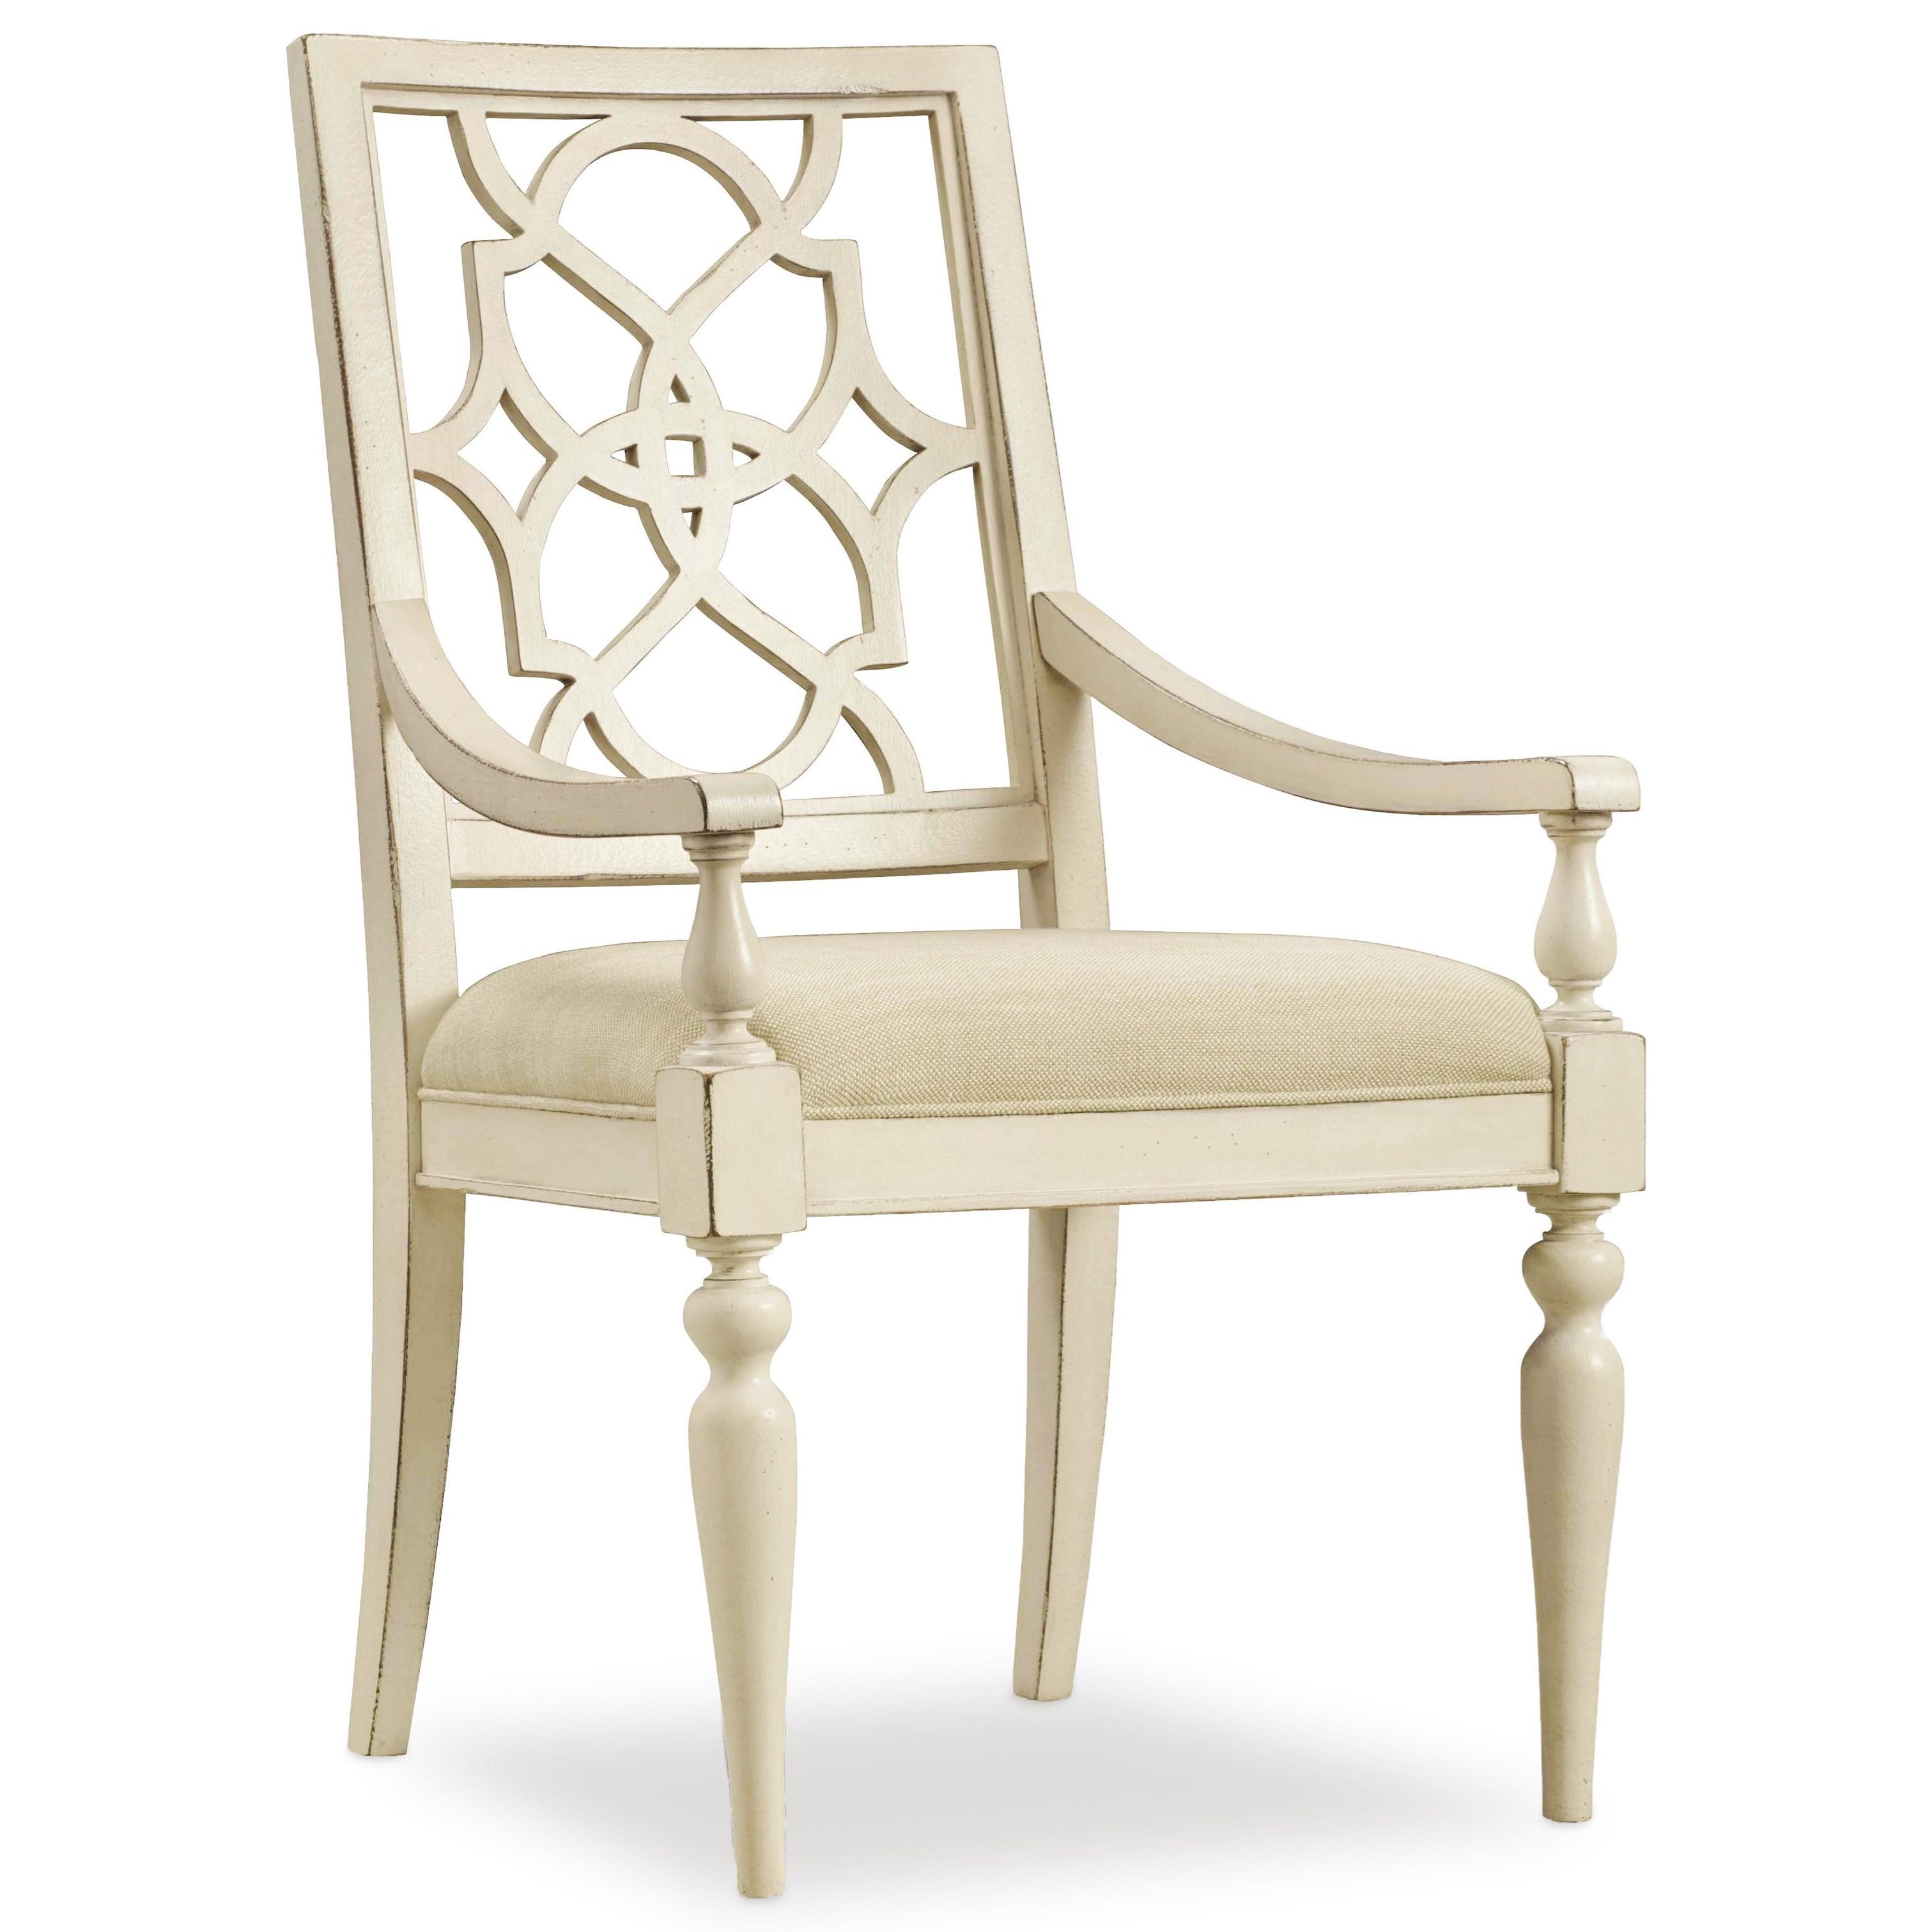 Hamilton Home Gweneth Fretback Arm Chair  Upholstered